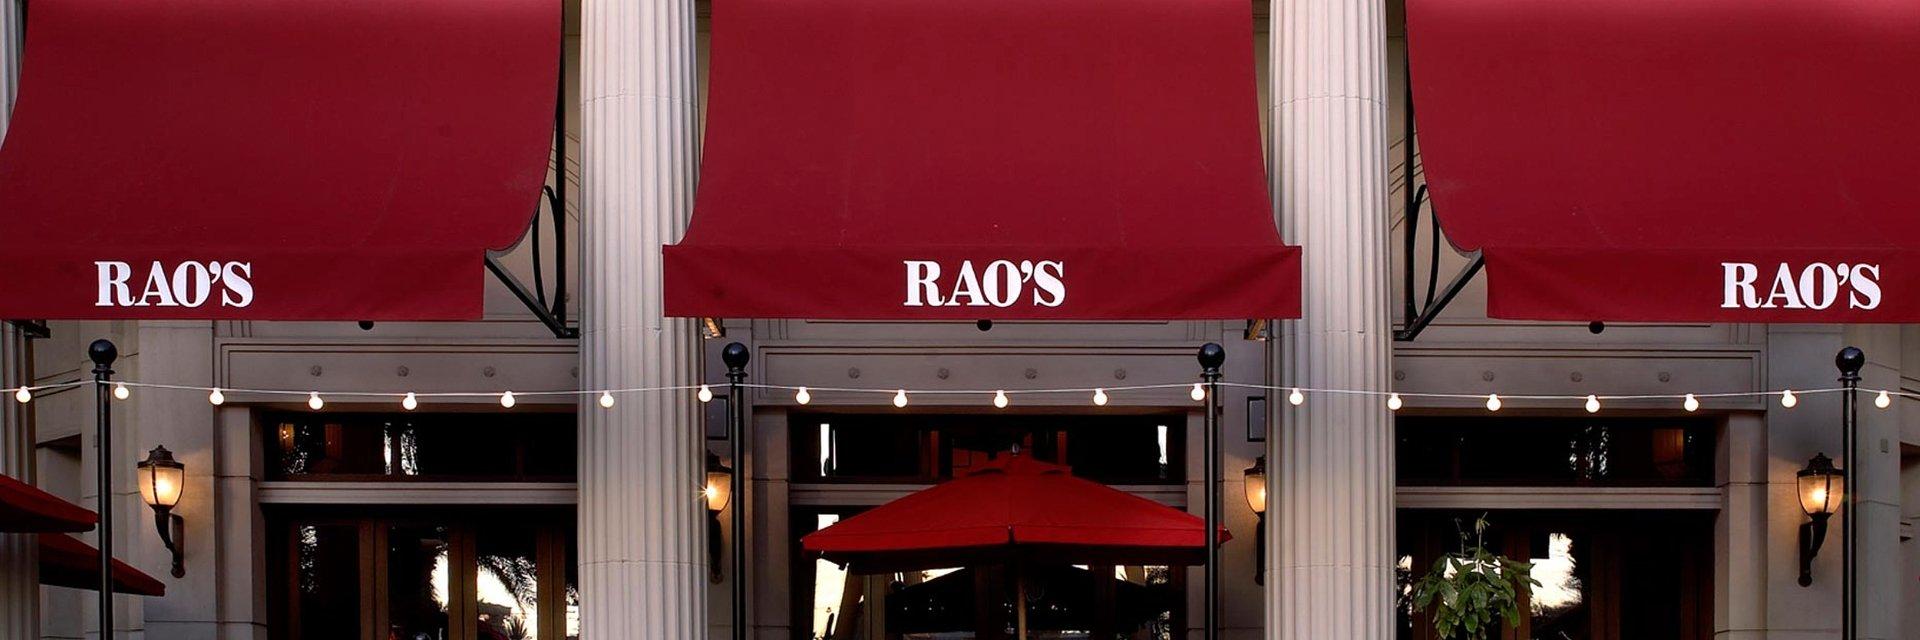 Dinner at Rao's